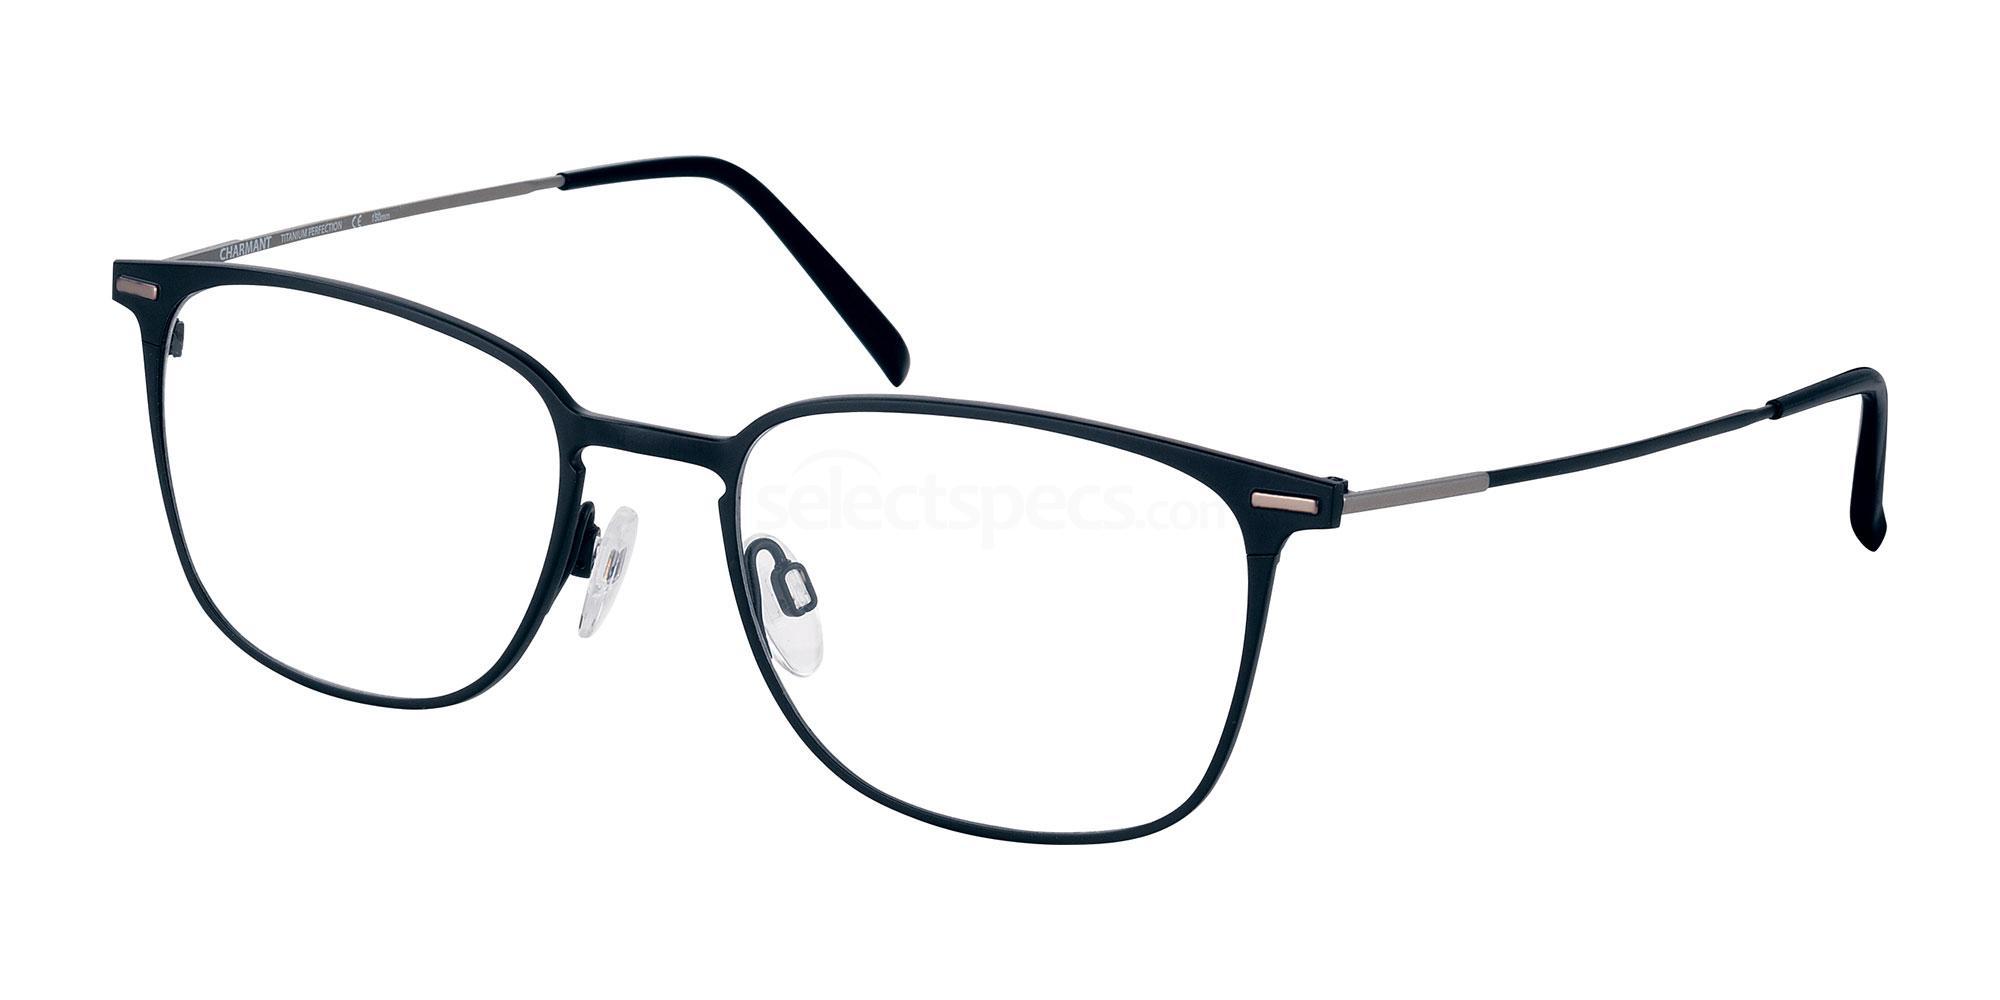 BK CH29711 Glasses, Charmant Titanium Perfection